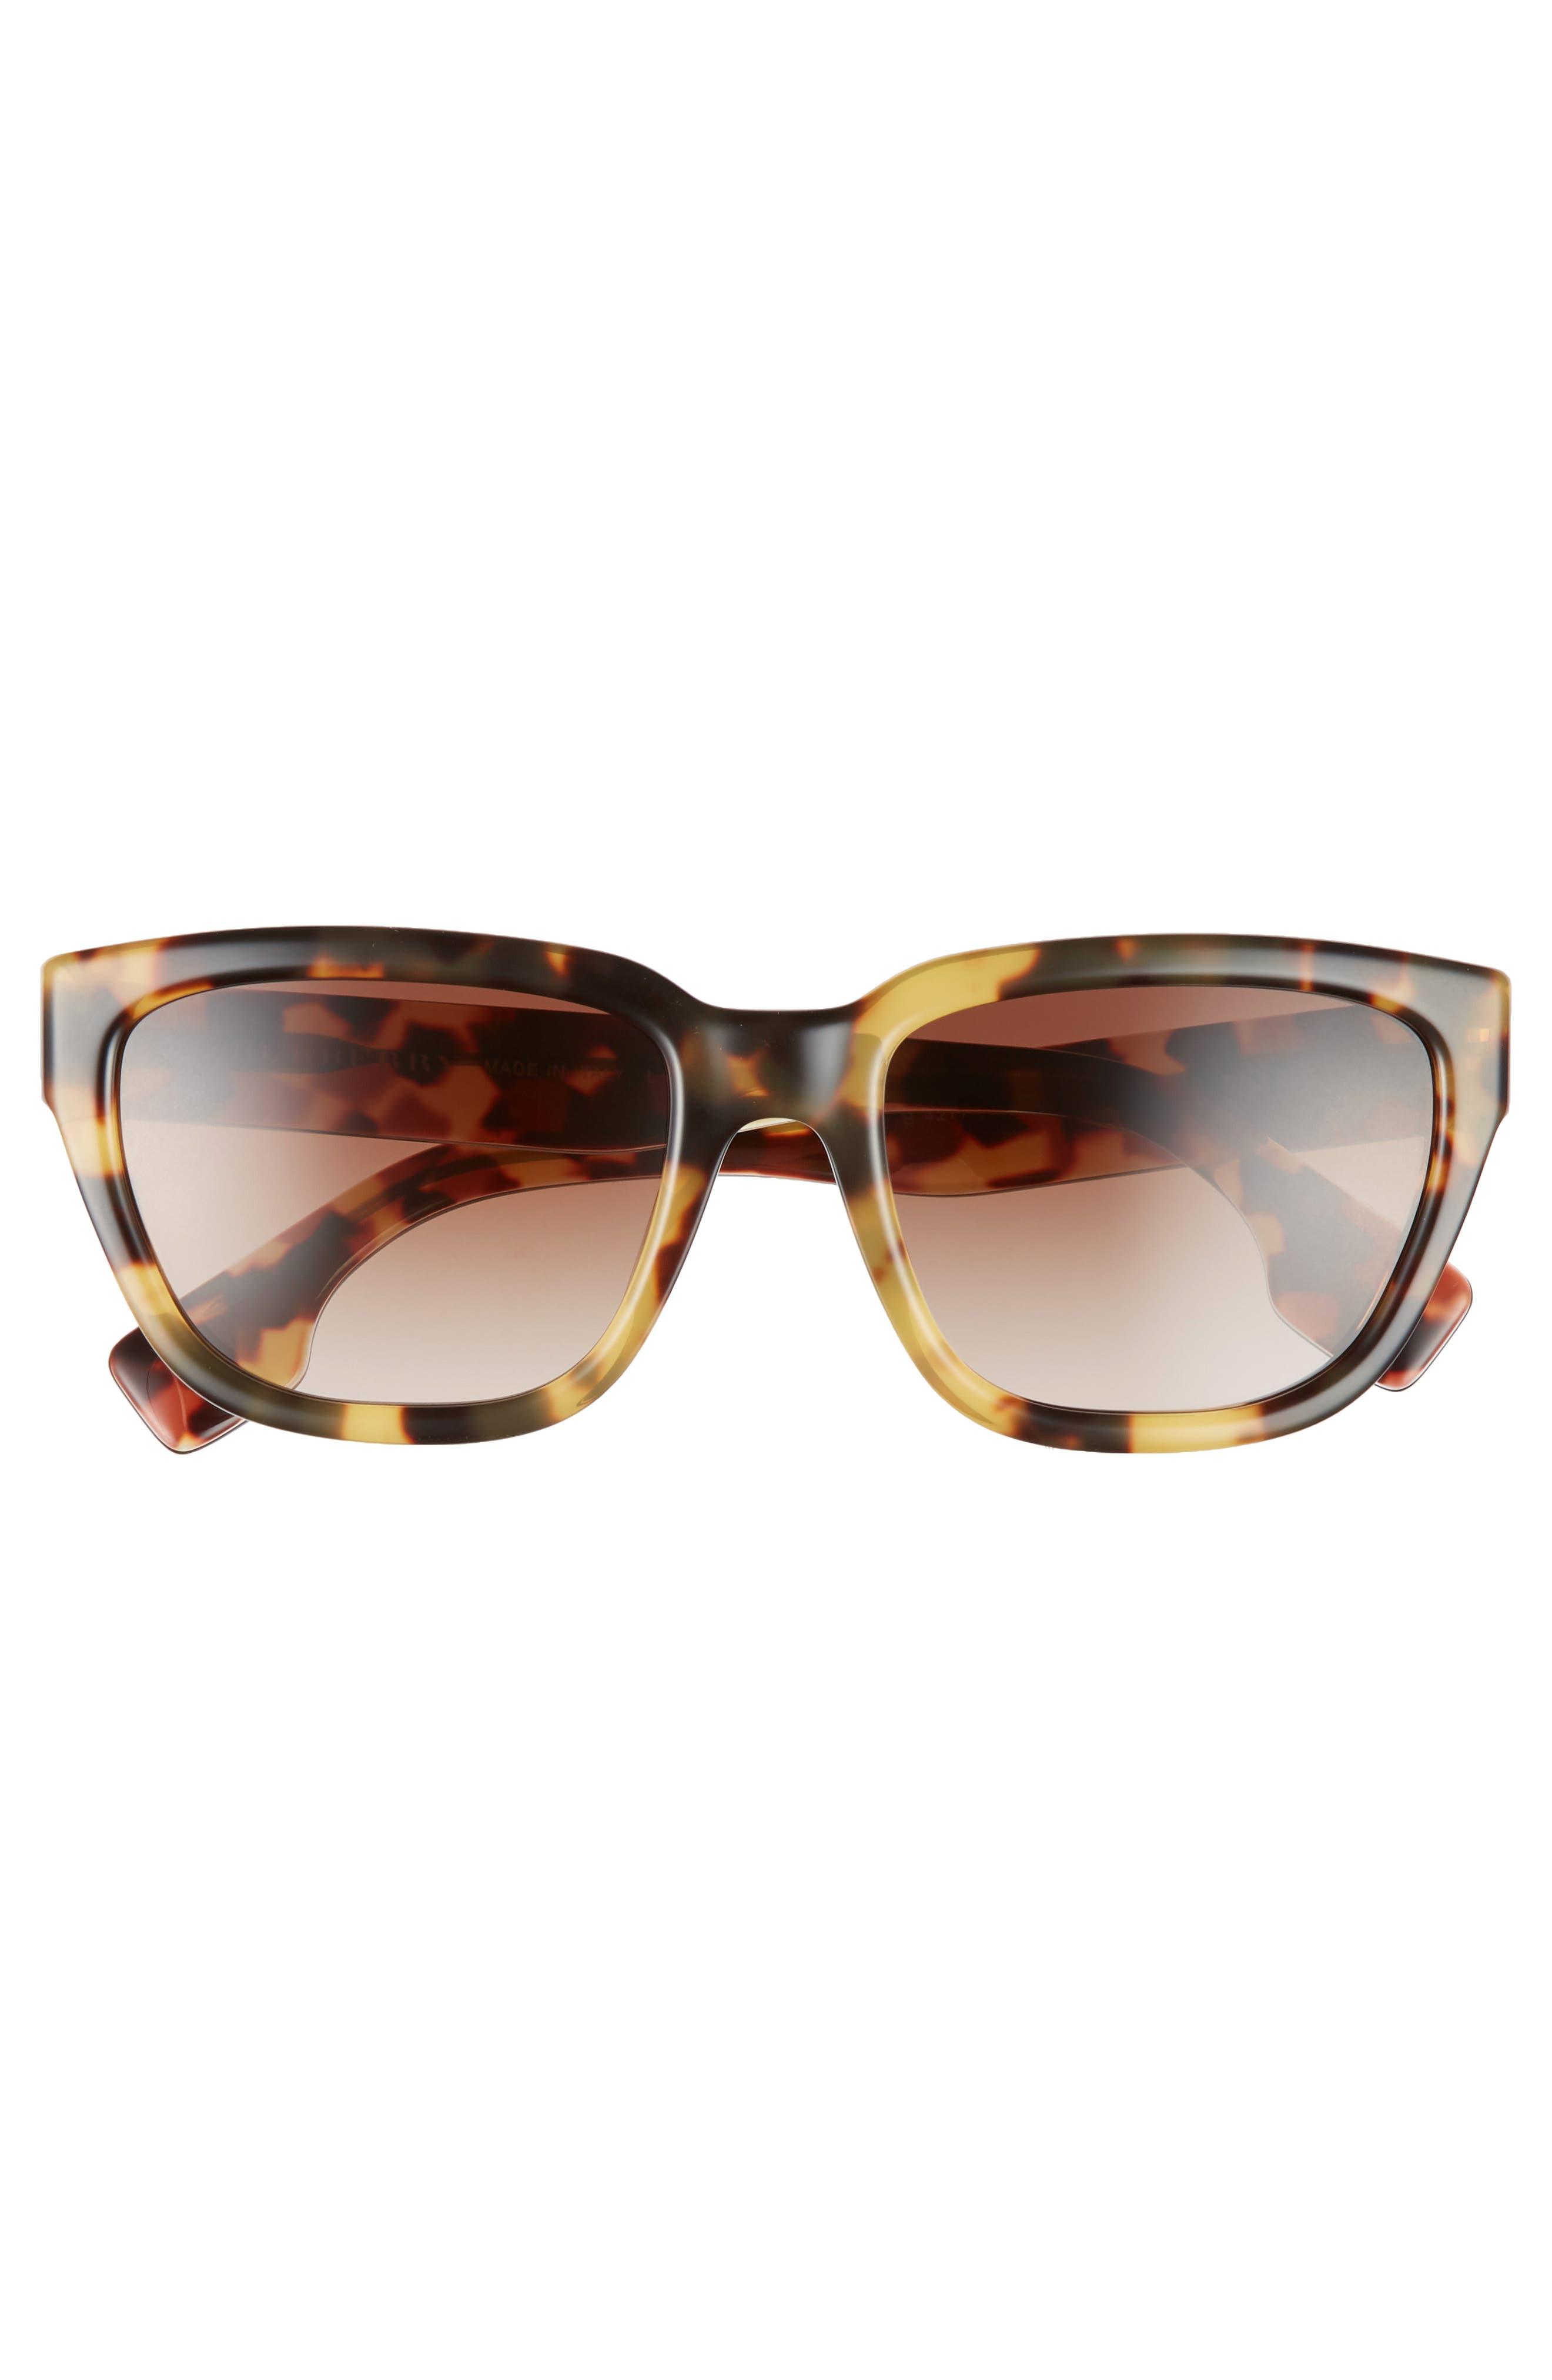 54mm Square Sunglasses,                             Alternate thumbnail 3, color,                             LITE HAVANA/ BROWN GRADIENT